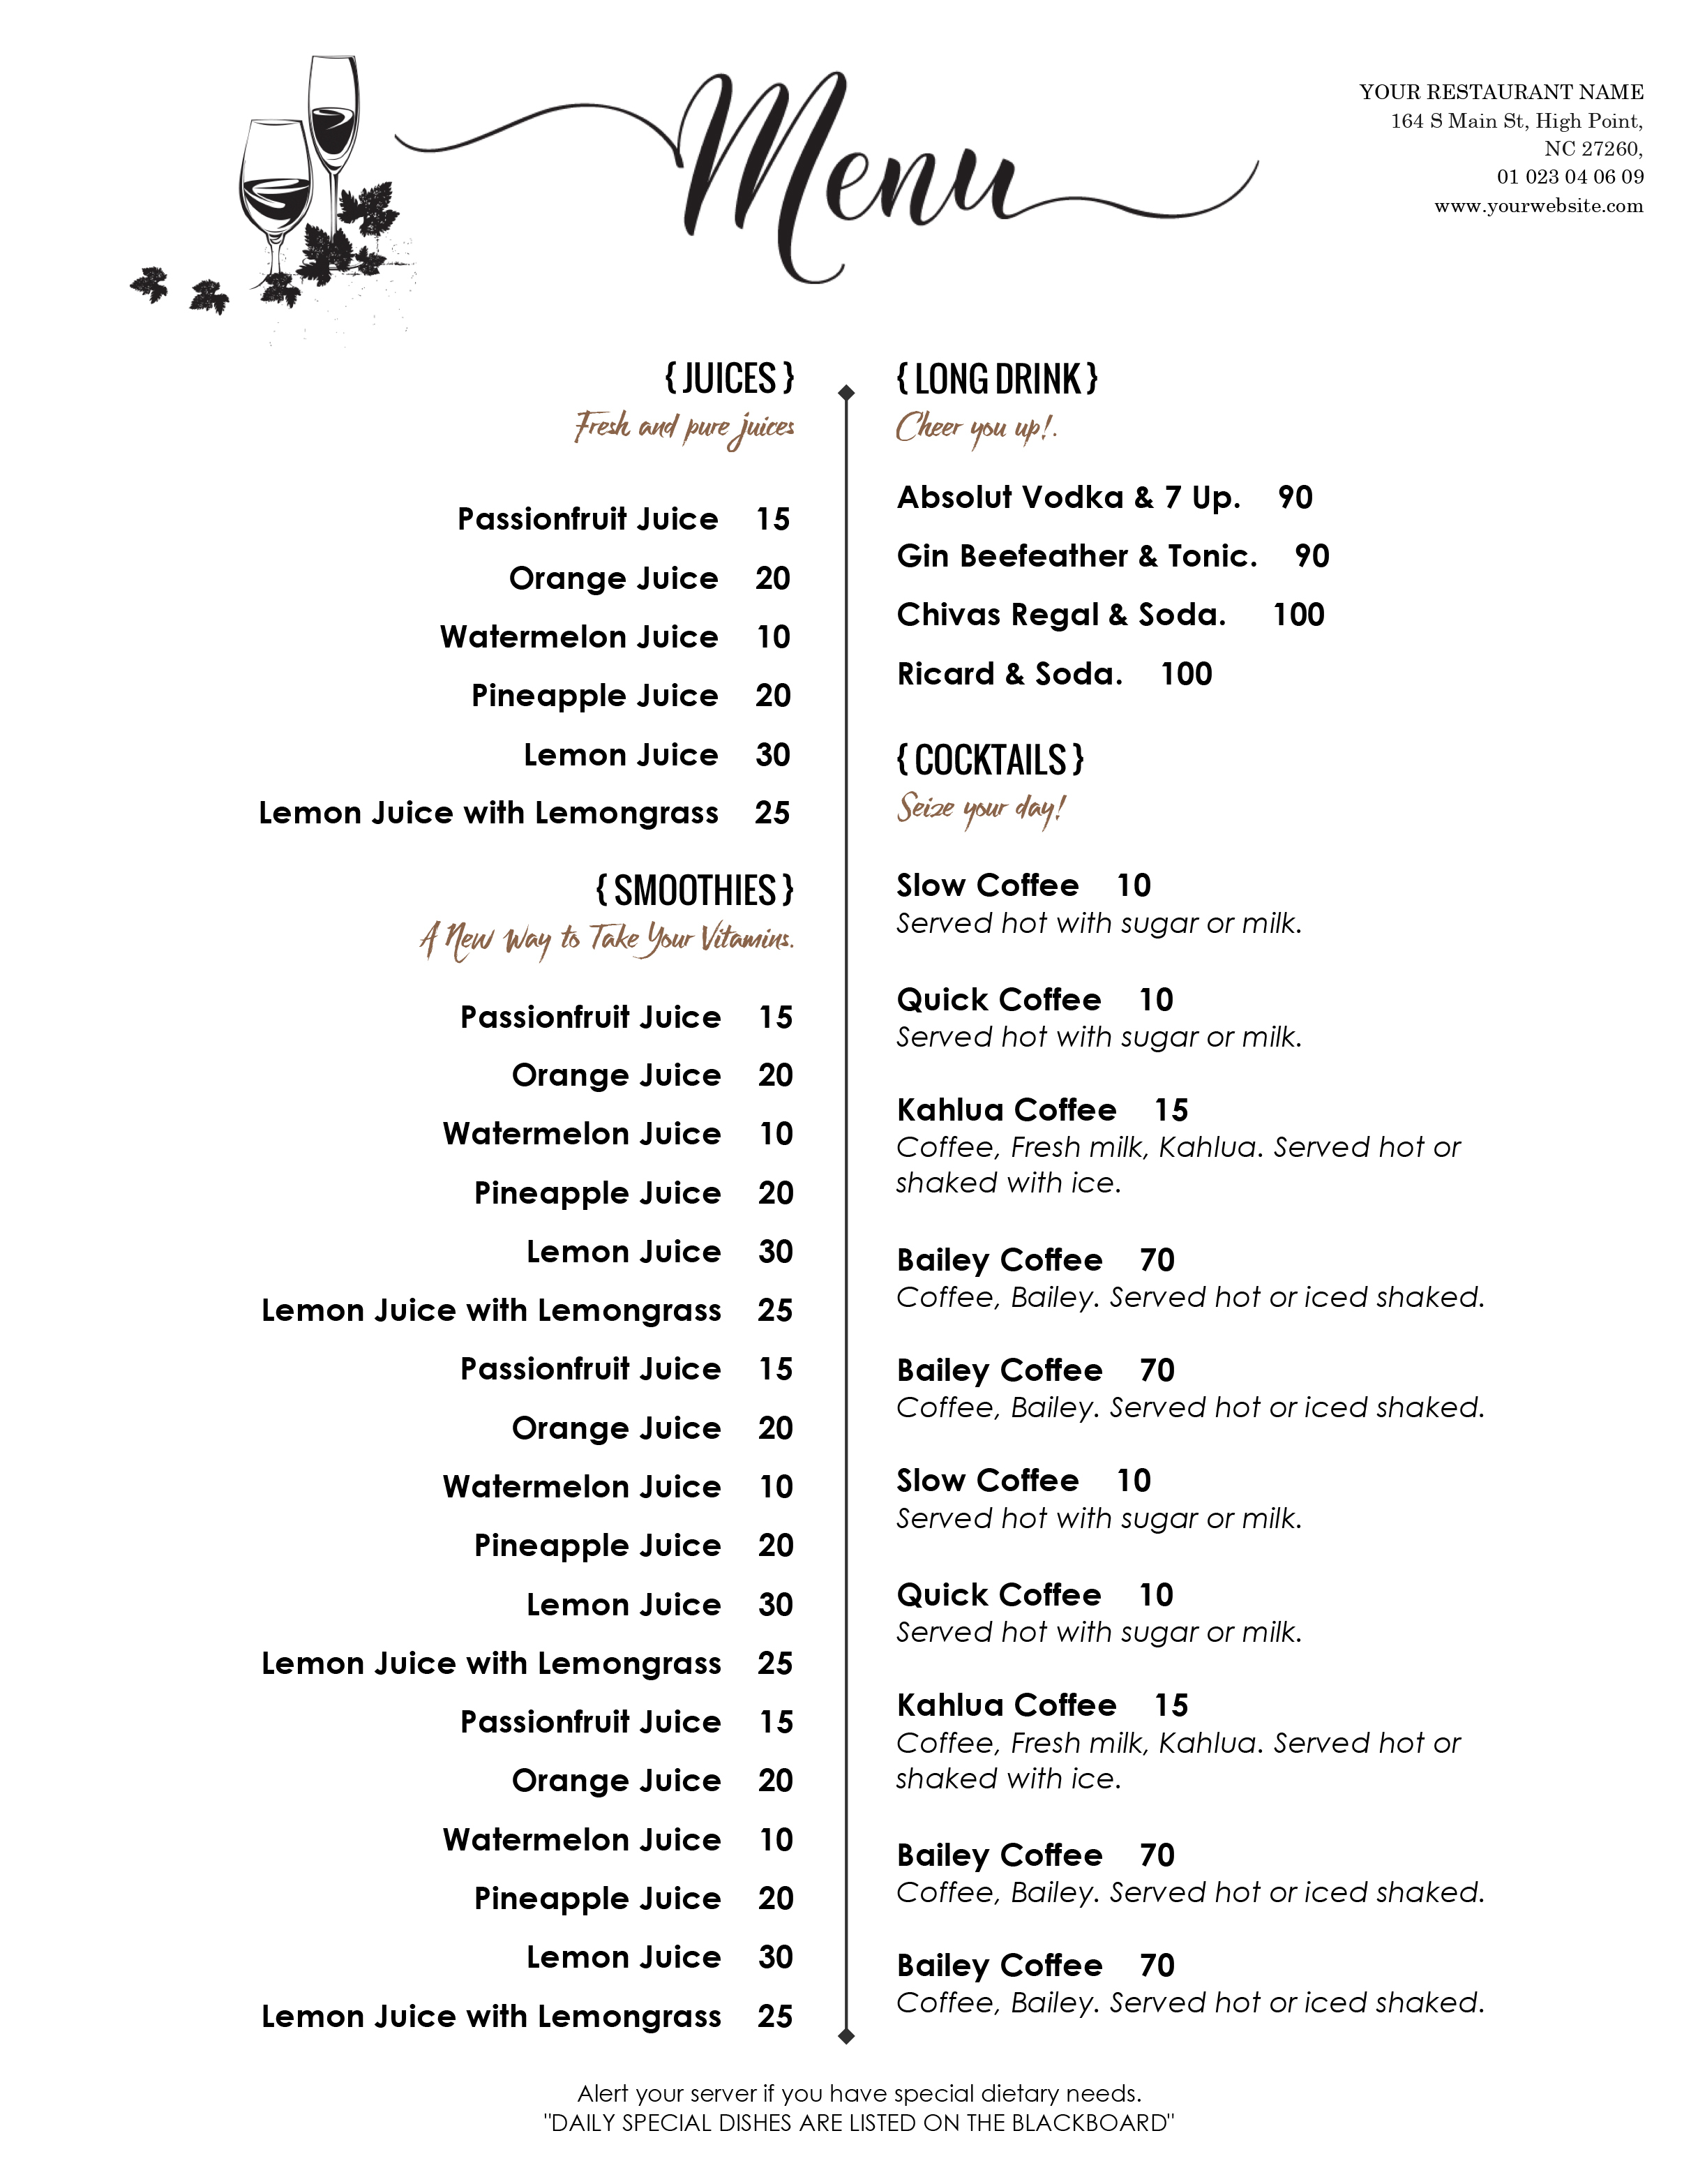 001 Free Menu Template For Word Ideas ~ Ulyssesroom - Free Printable Menu Templates Word